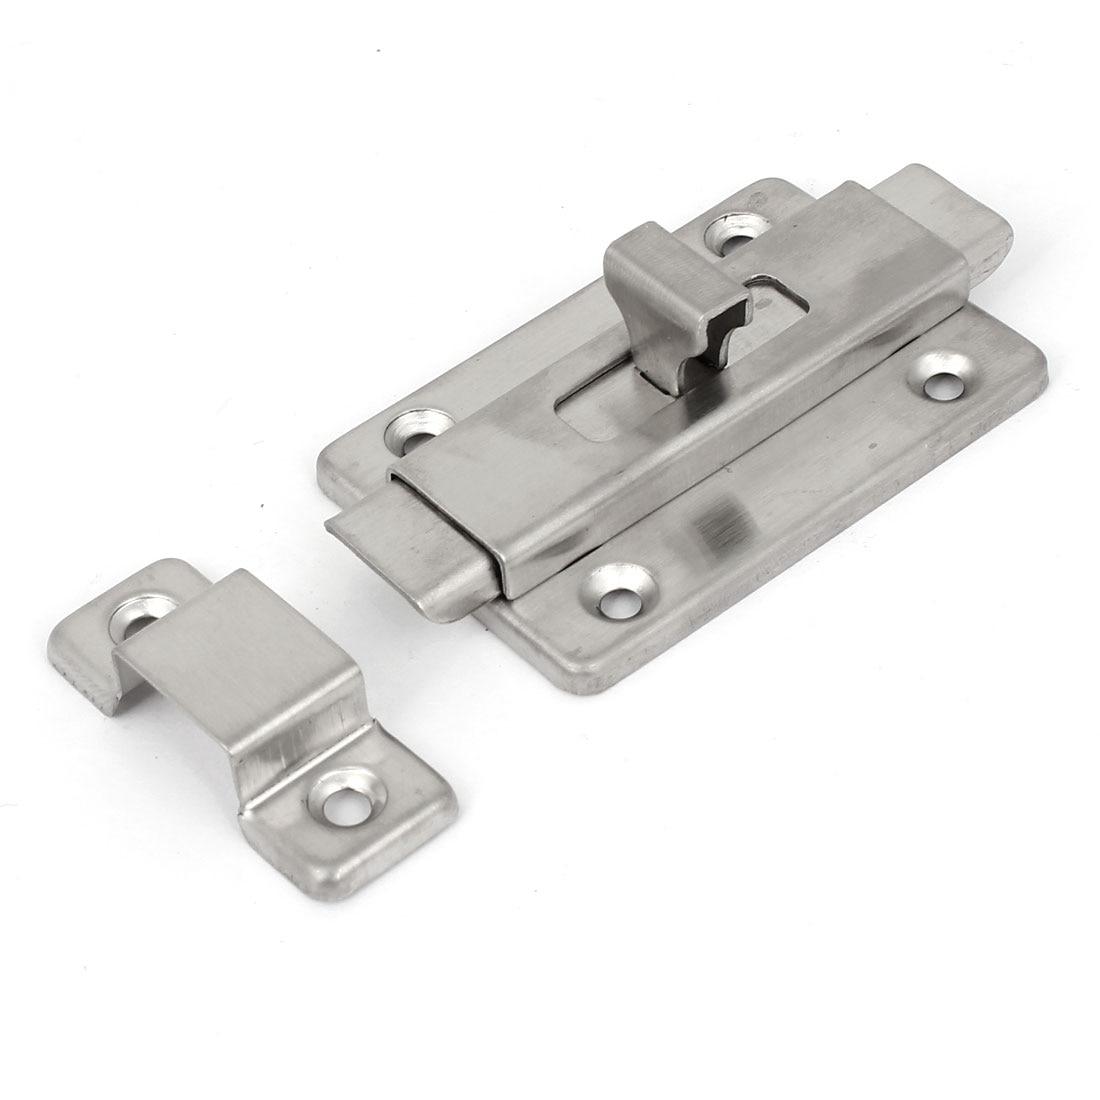 Door Latch Lock popular door safety latch-buy cheap door safety latch lots from